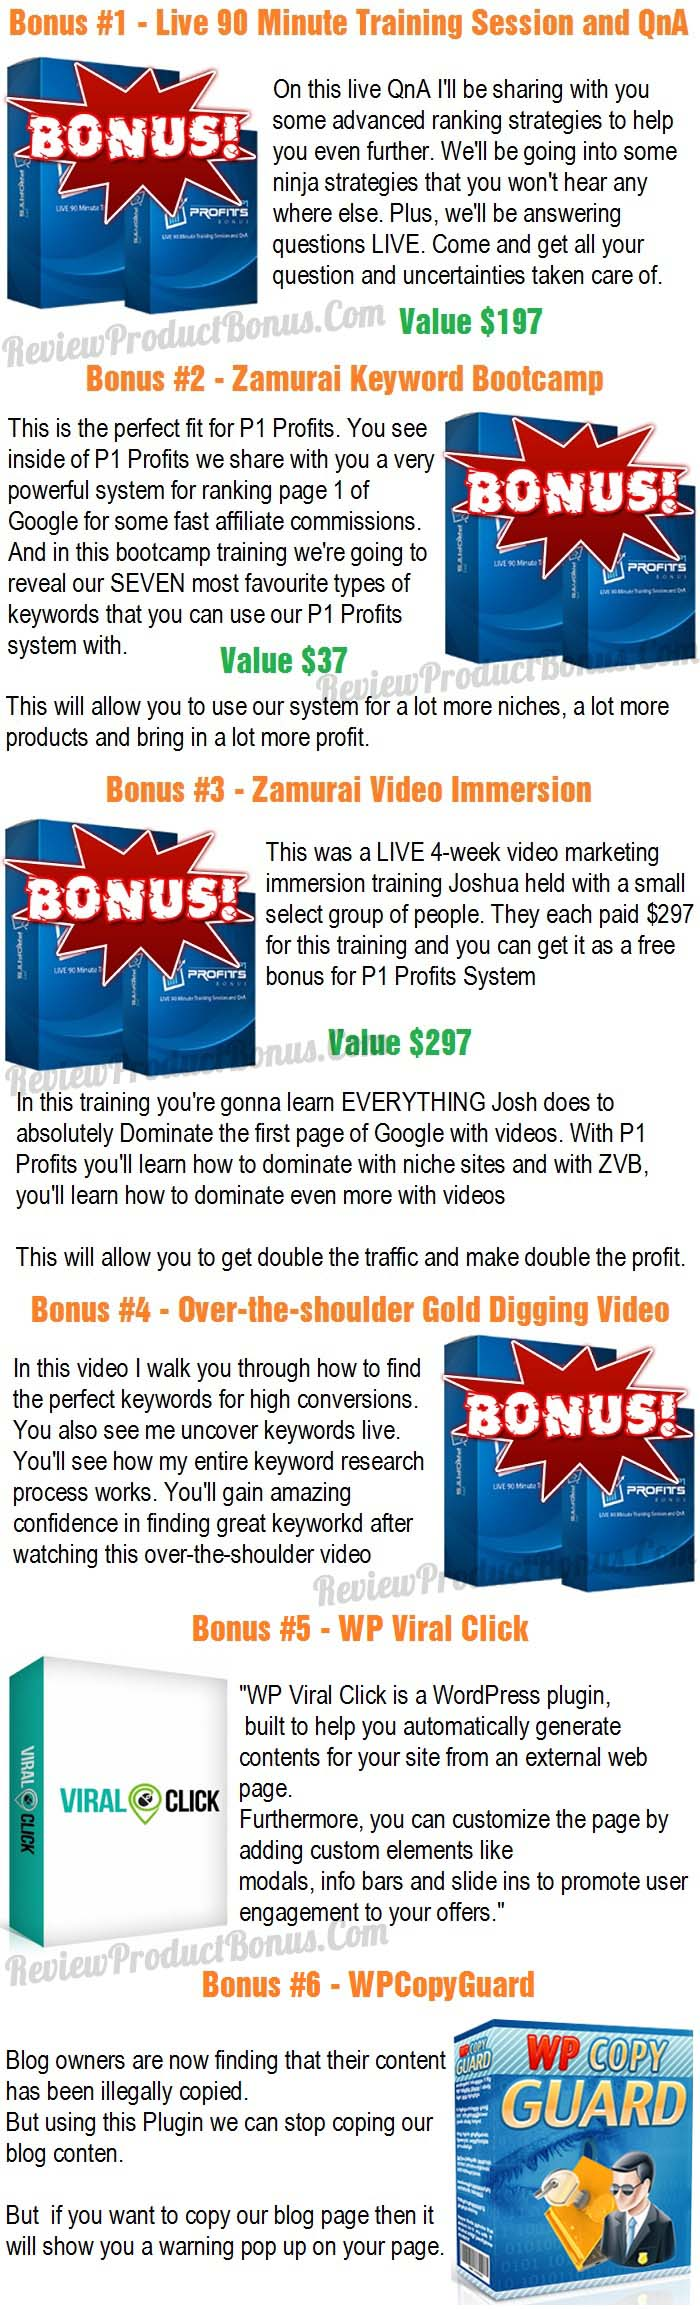 P1 Profits Bonus